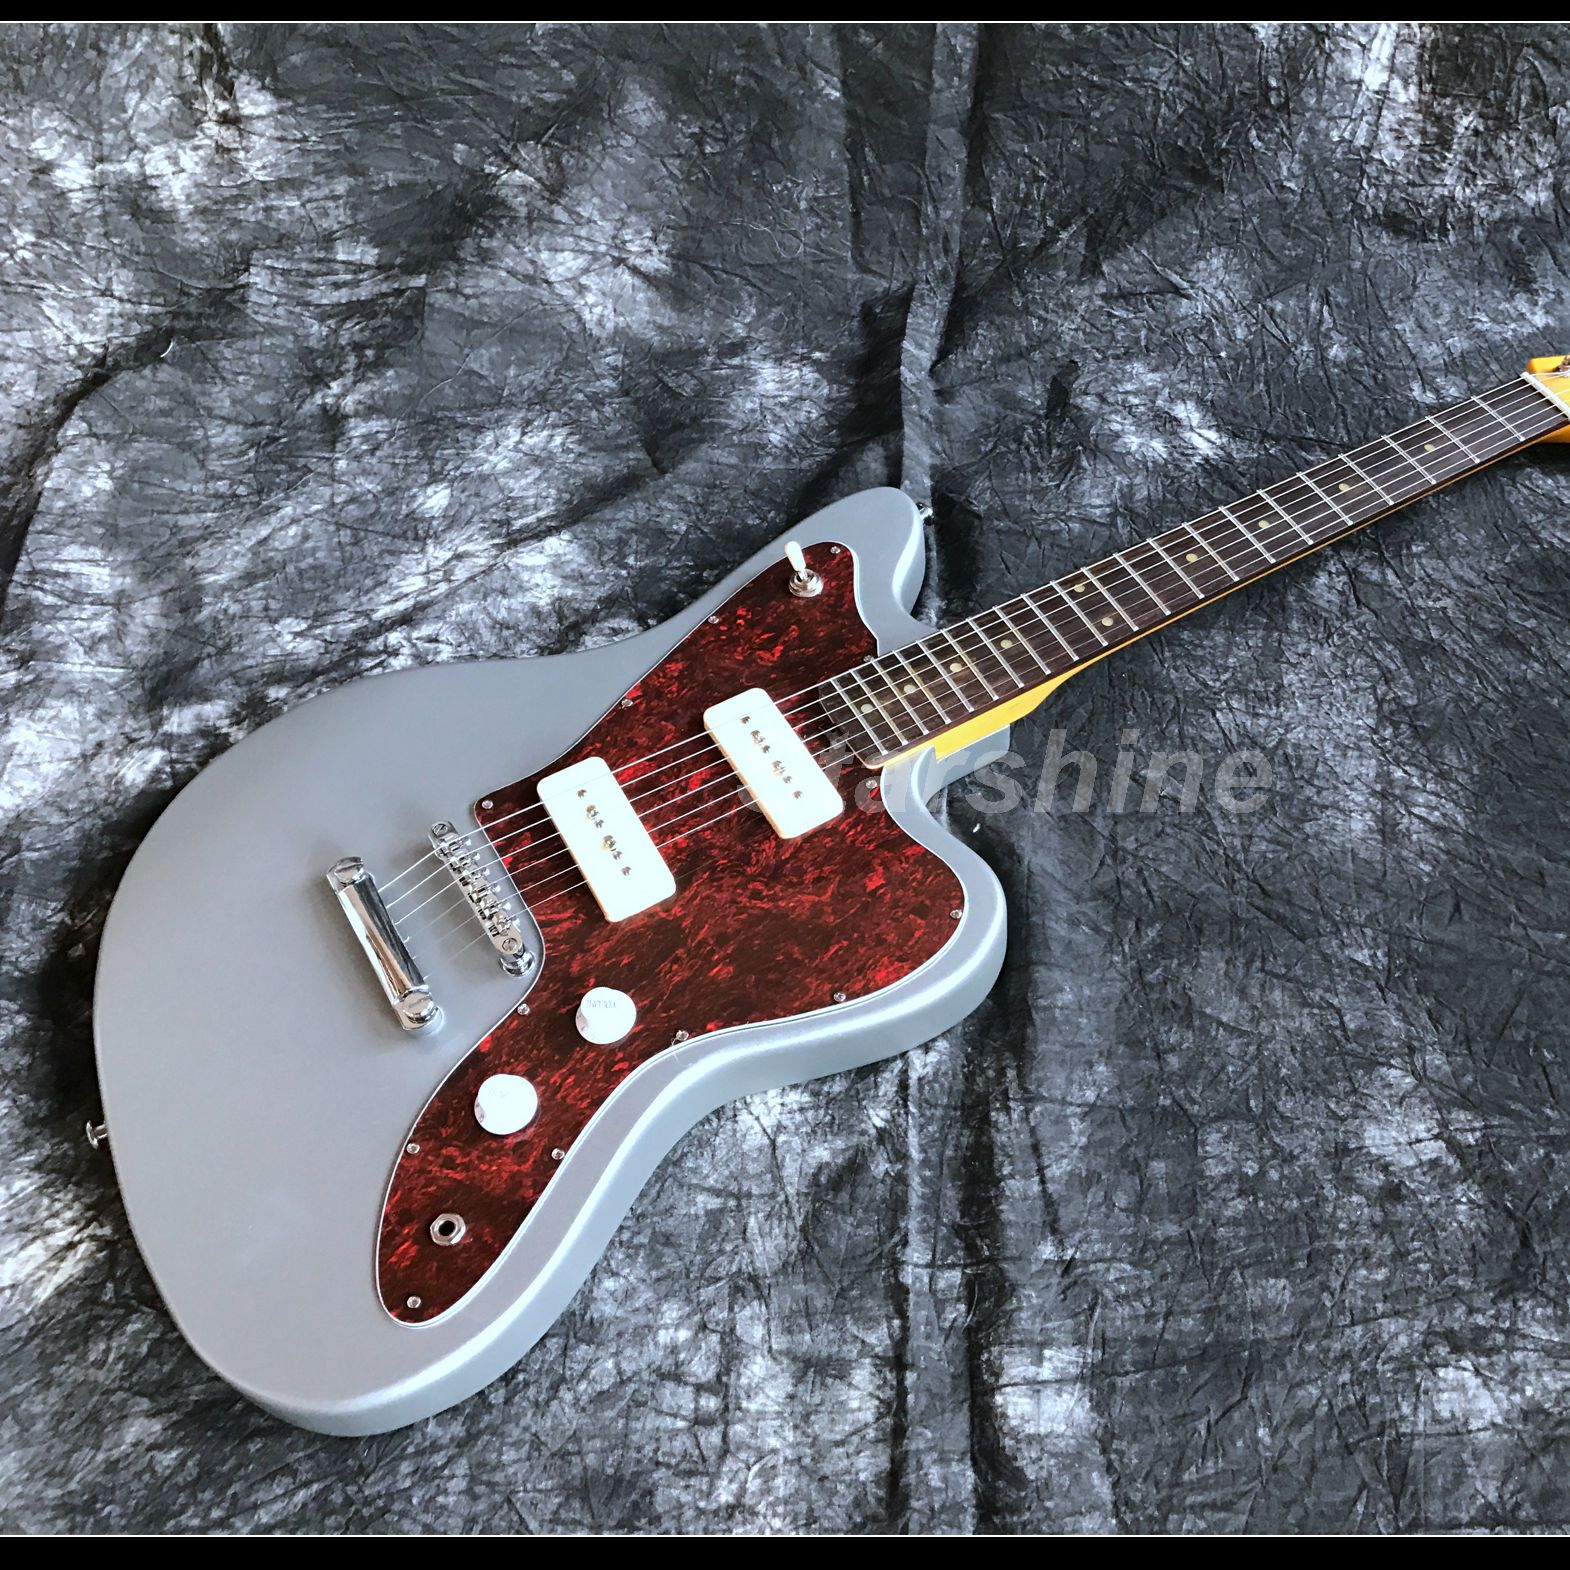 Top Quality Jaguar Custom Shop Electric Guitar T-ER7 Metal Gray Color P90 pickups